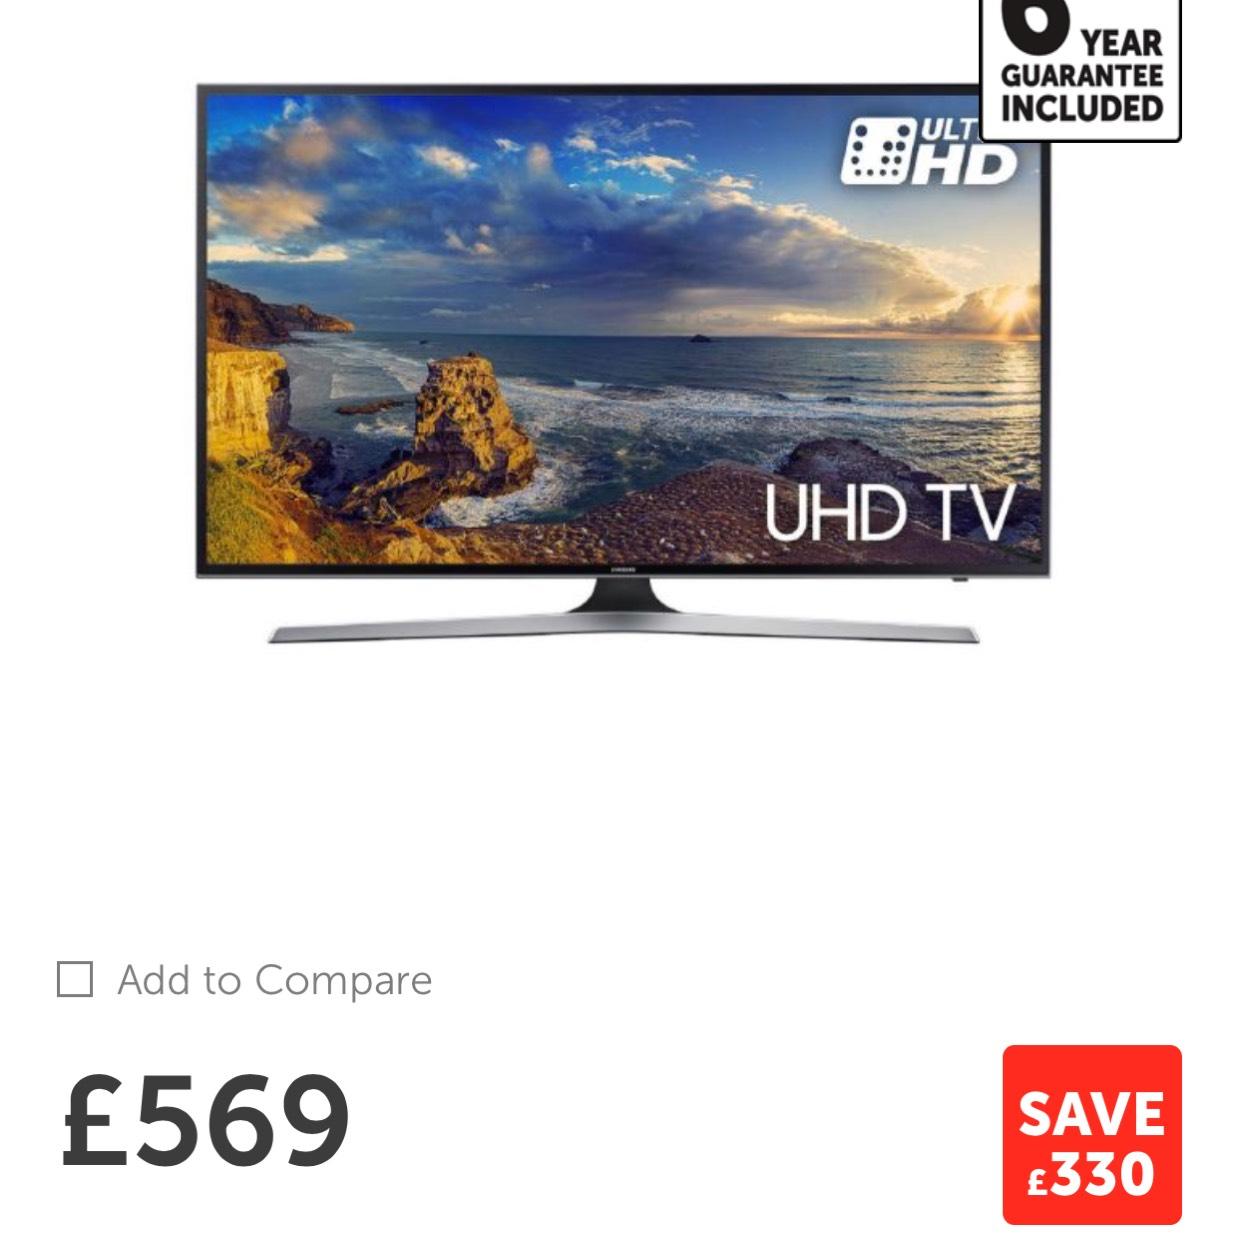 Samsung UE55MU6120 55 inch 4K Ultra HD HDR Smart LED TV TVPlus - Game deal expired. NB richer sounds